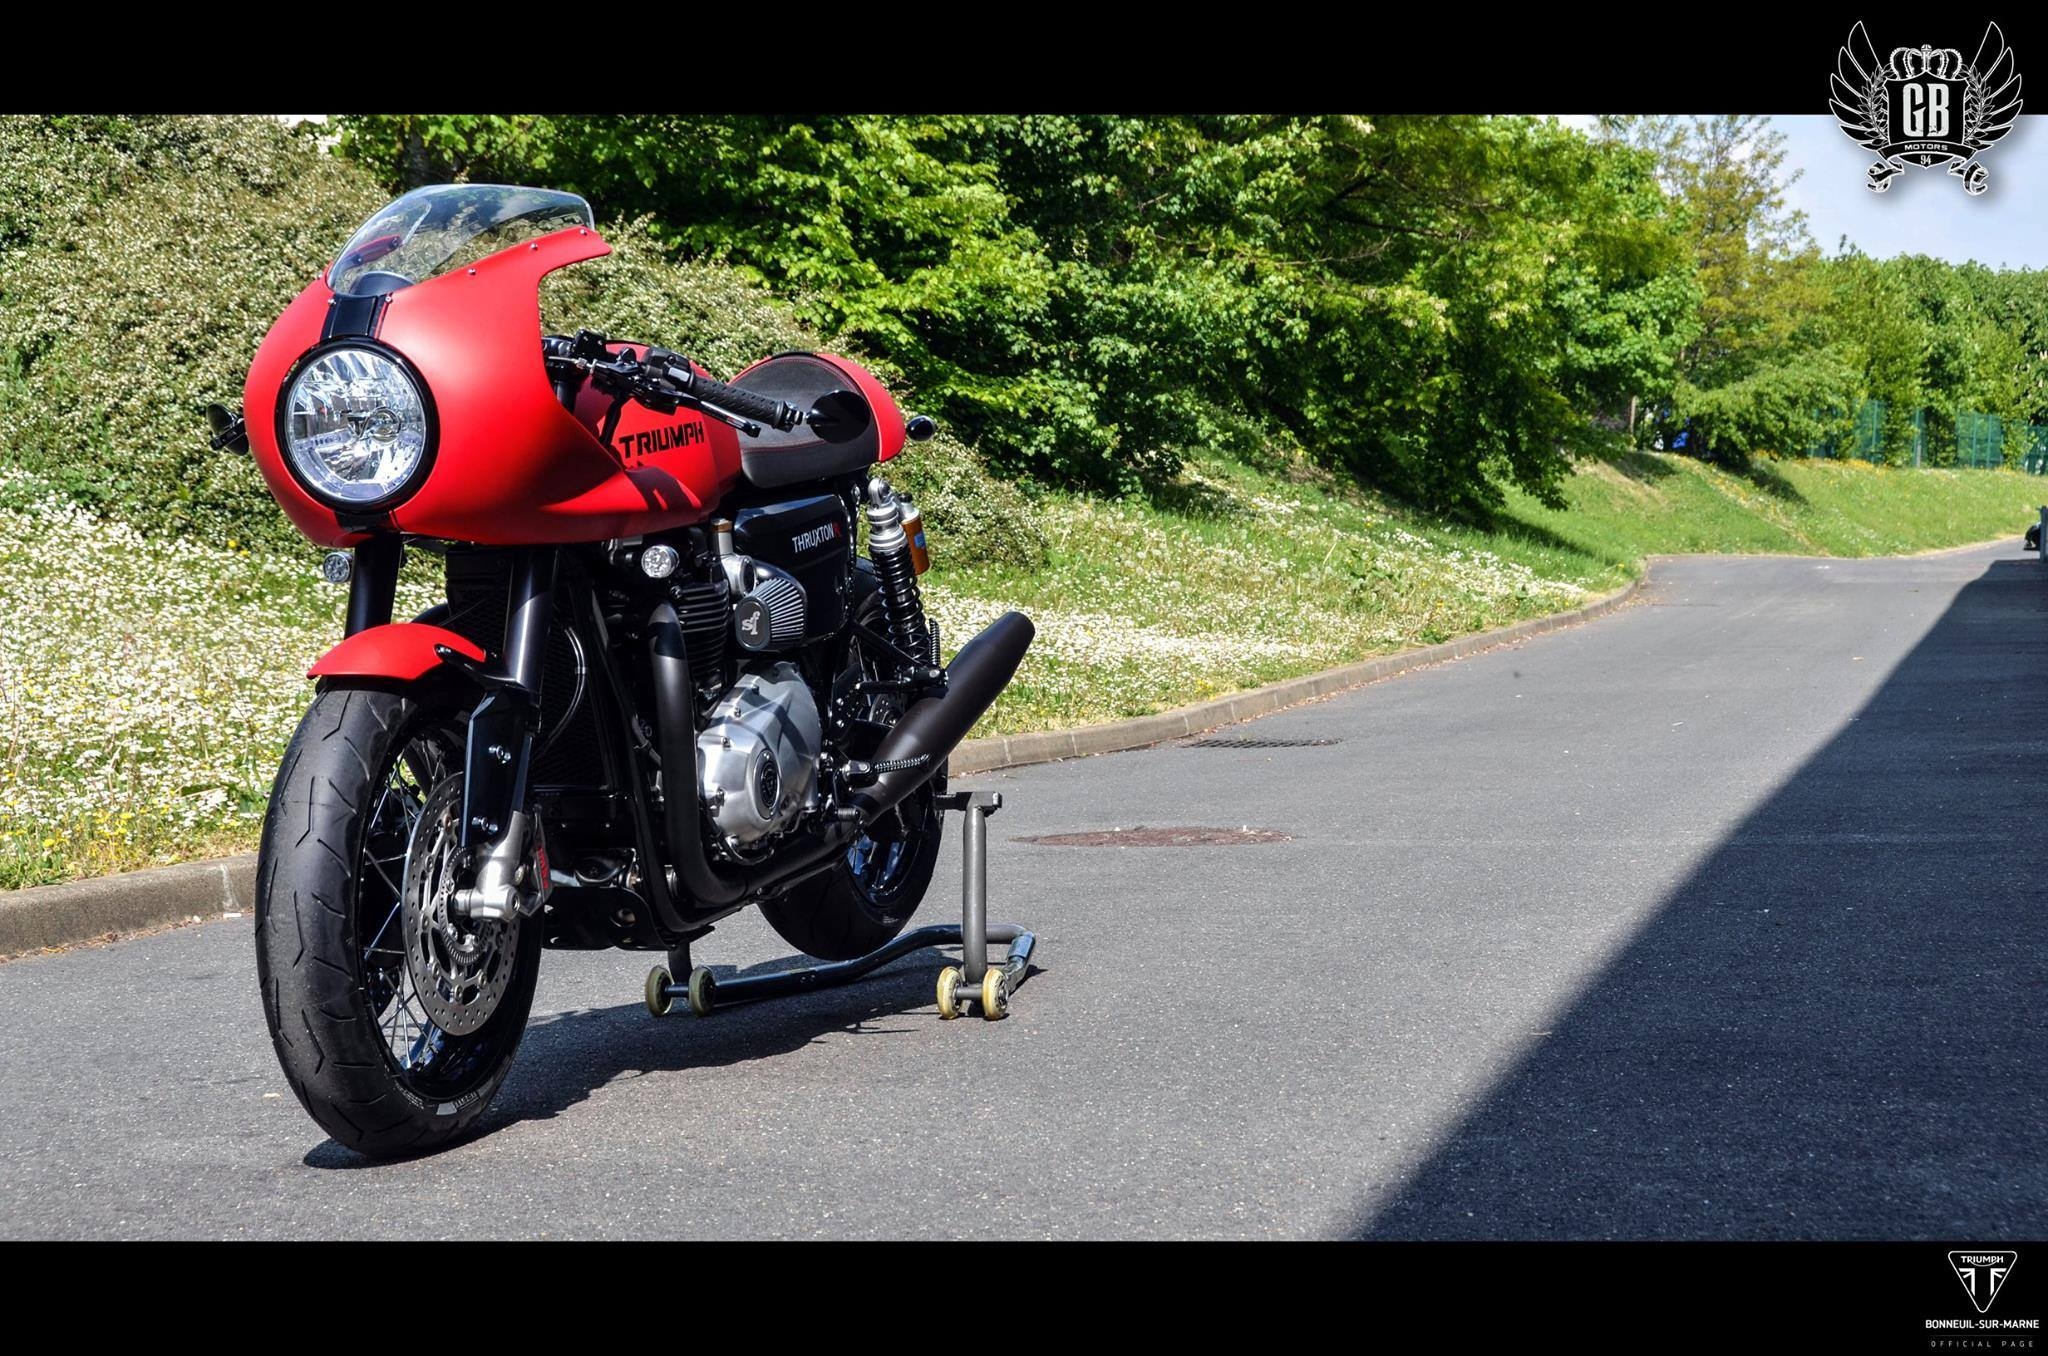 Triumph GB Motors 94 1